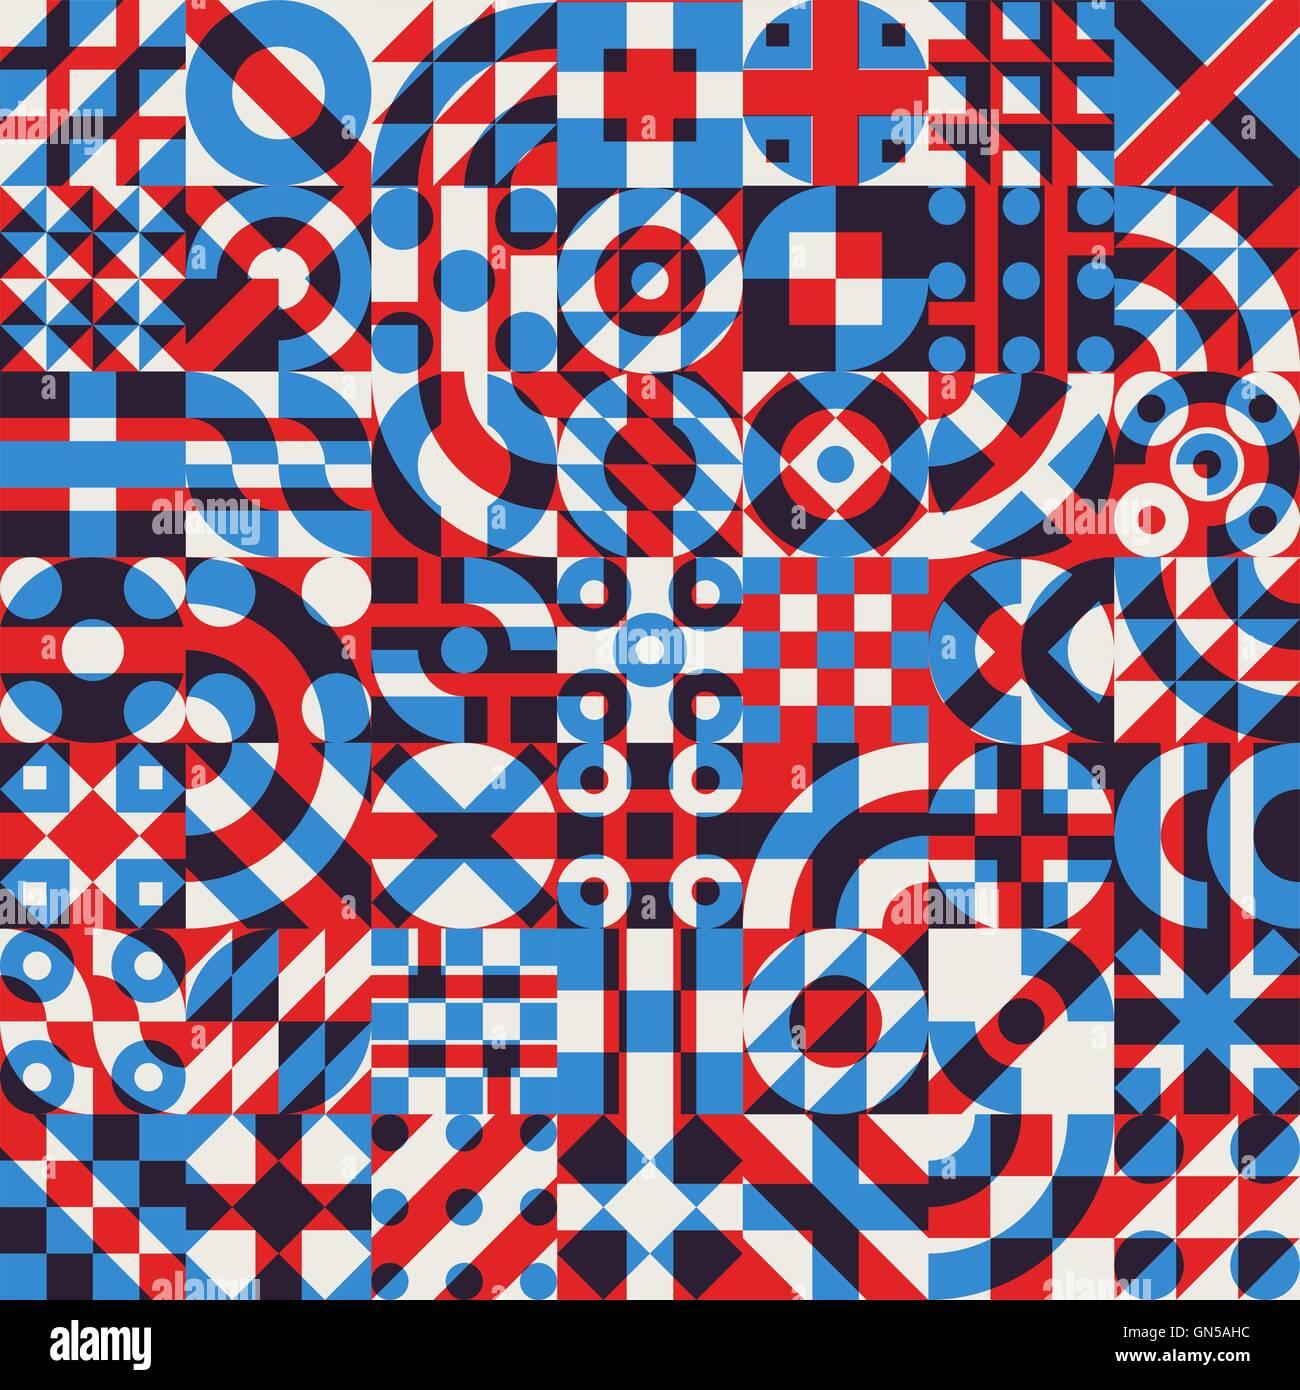 vector seamless blue red white color overlay irregular geometric